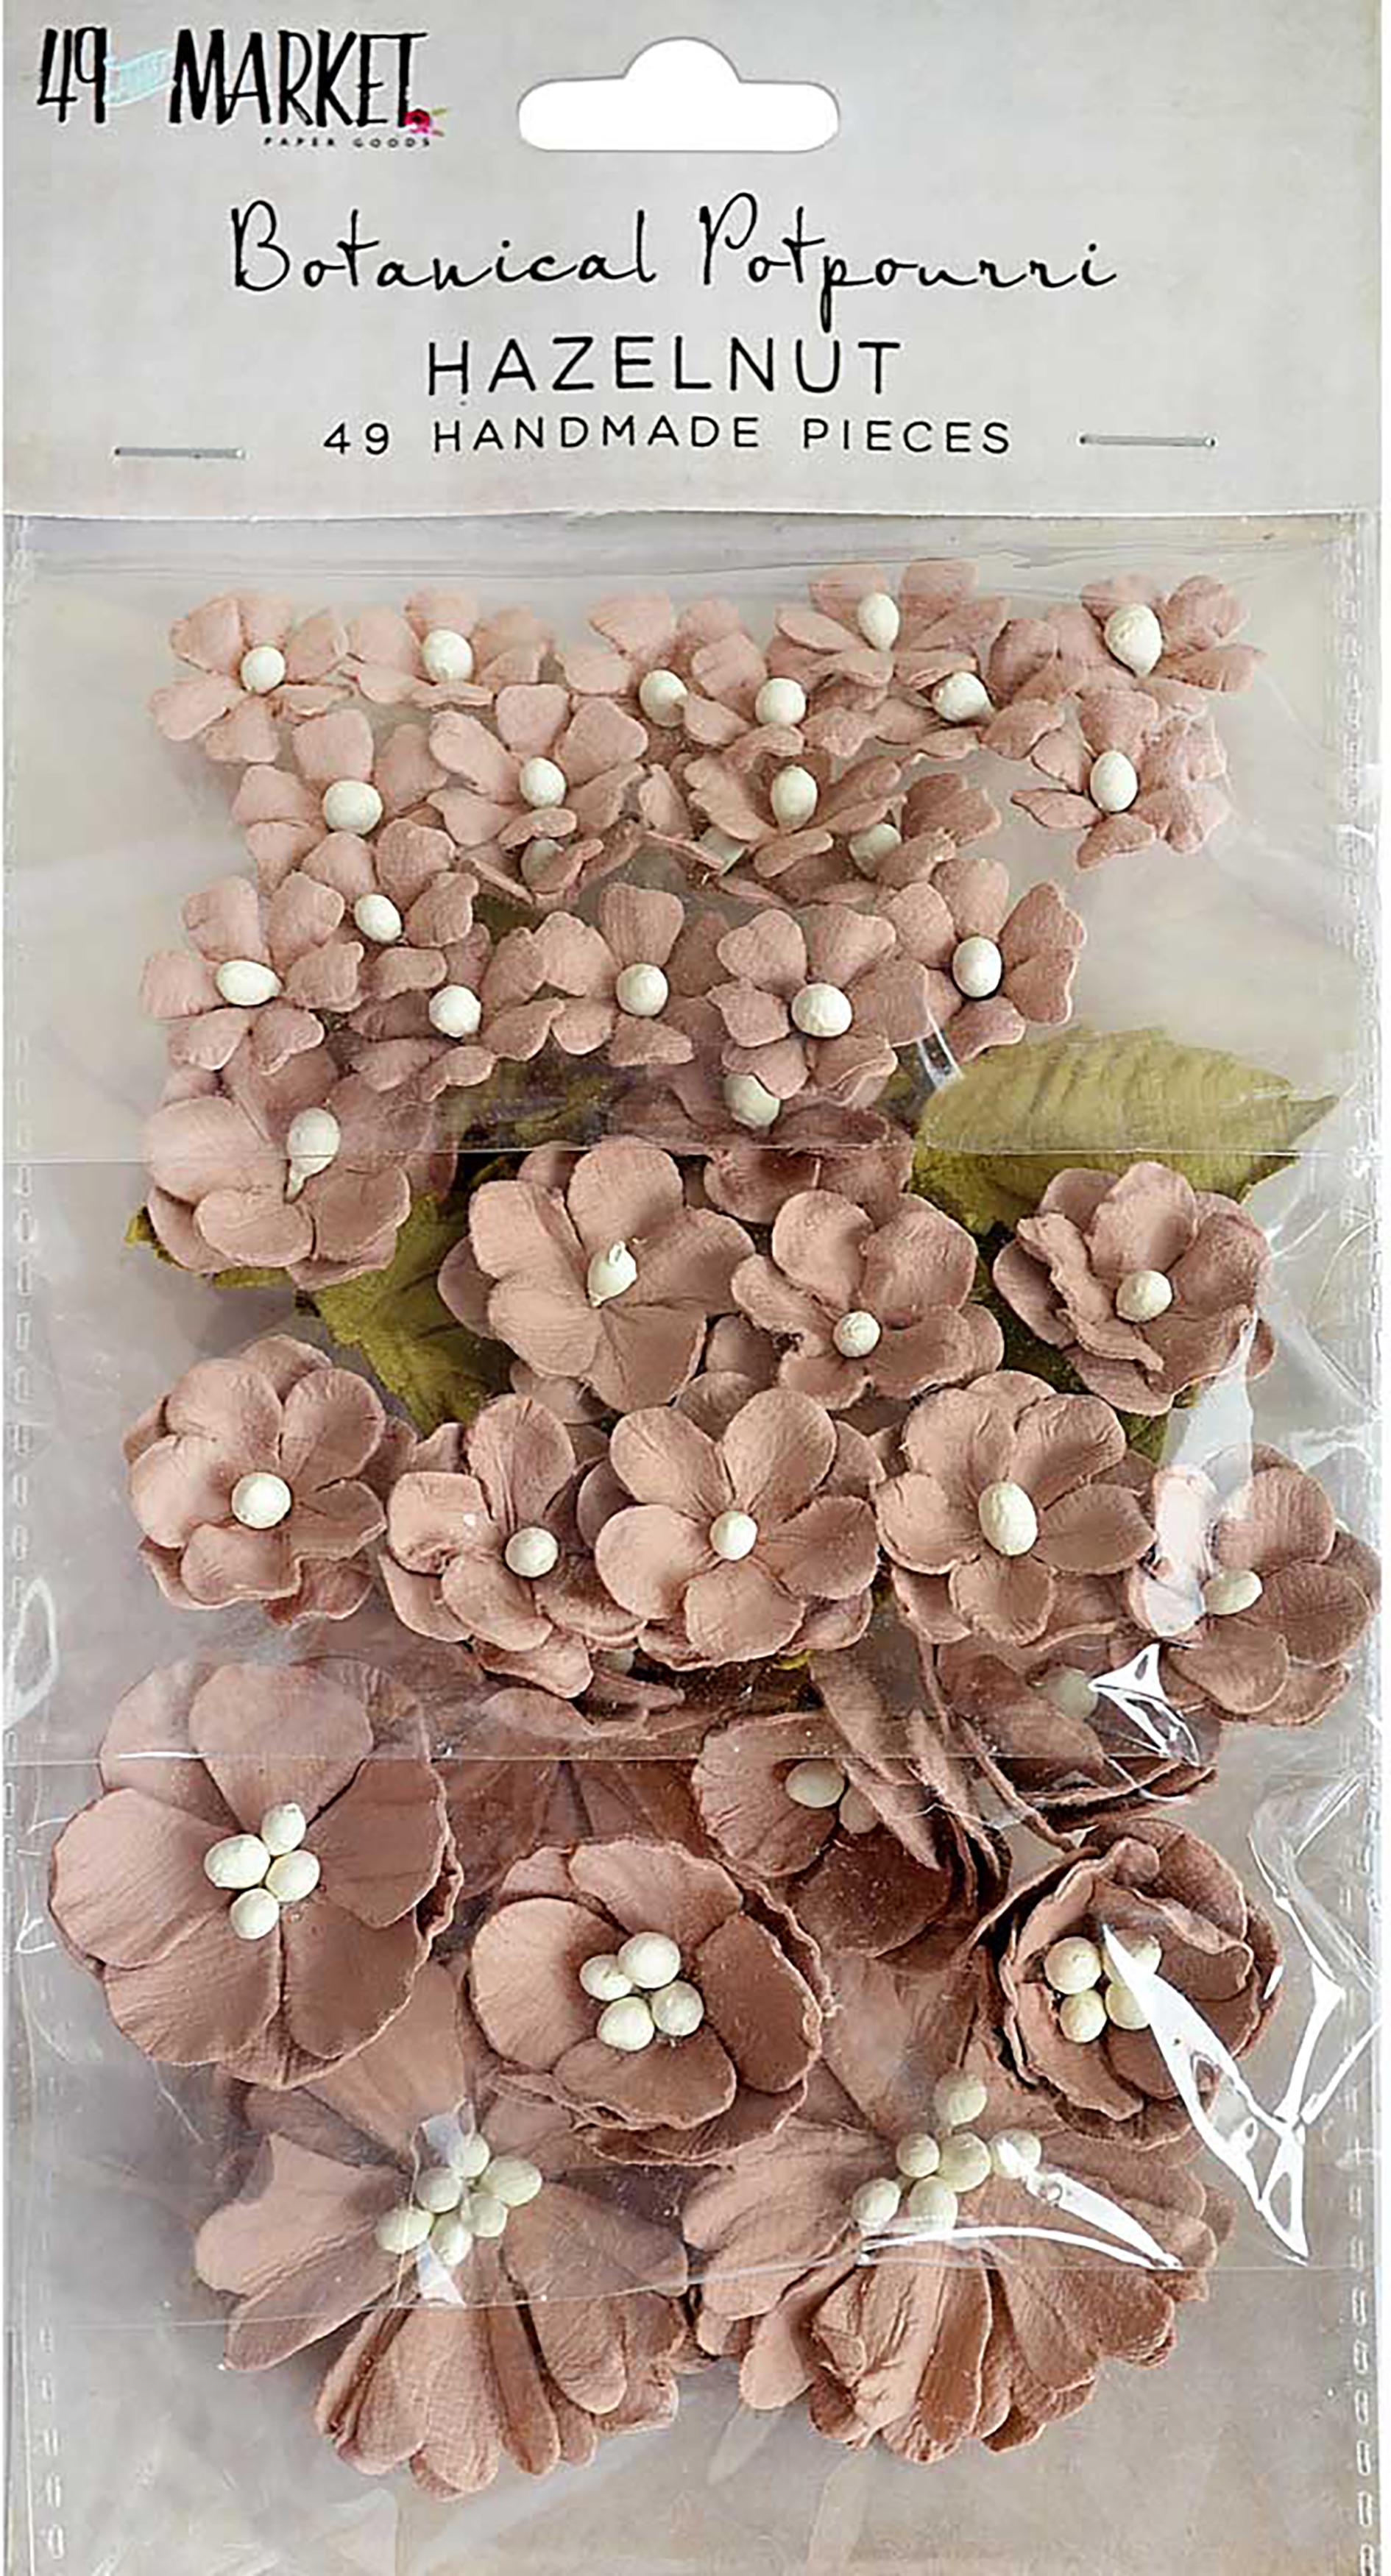 Botanical Potpourri Hazelnut